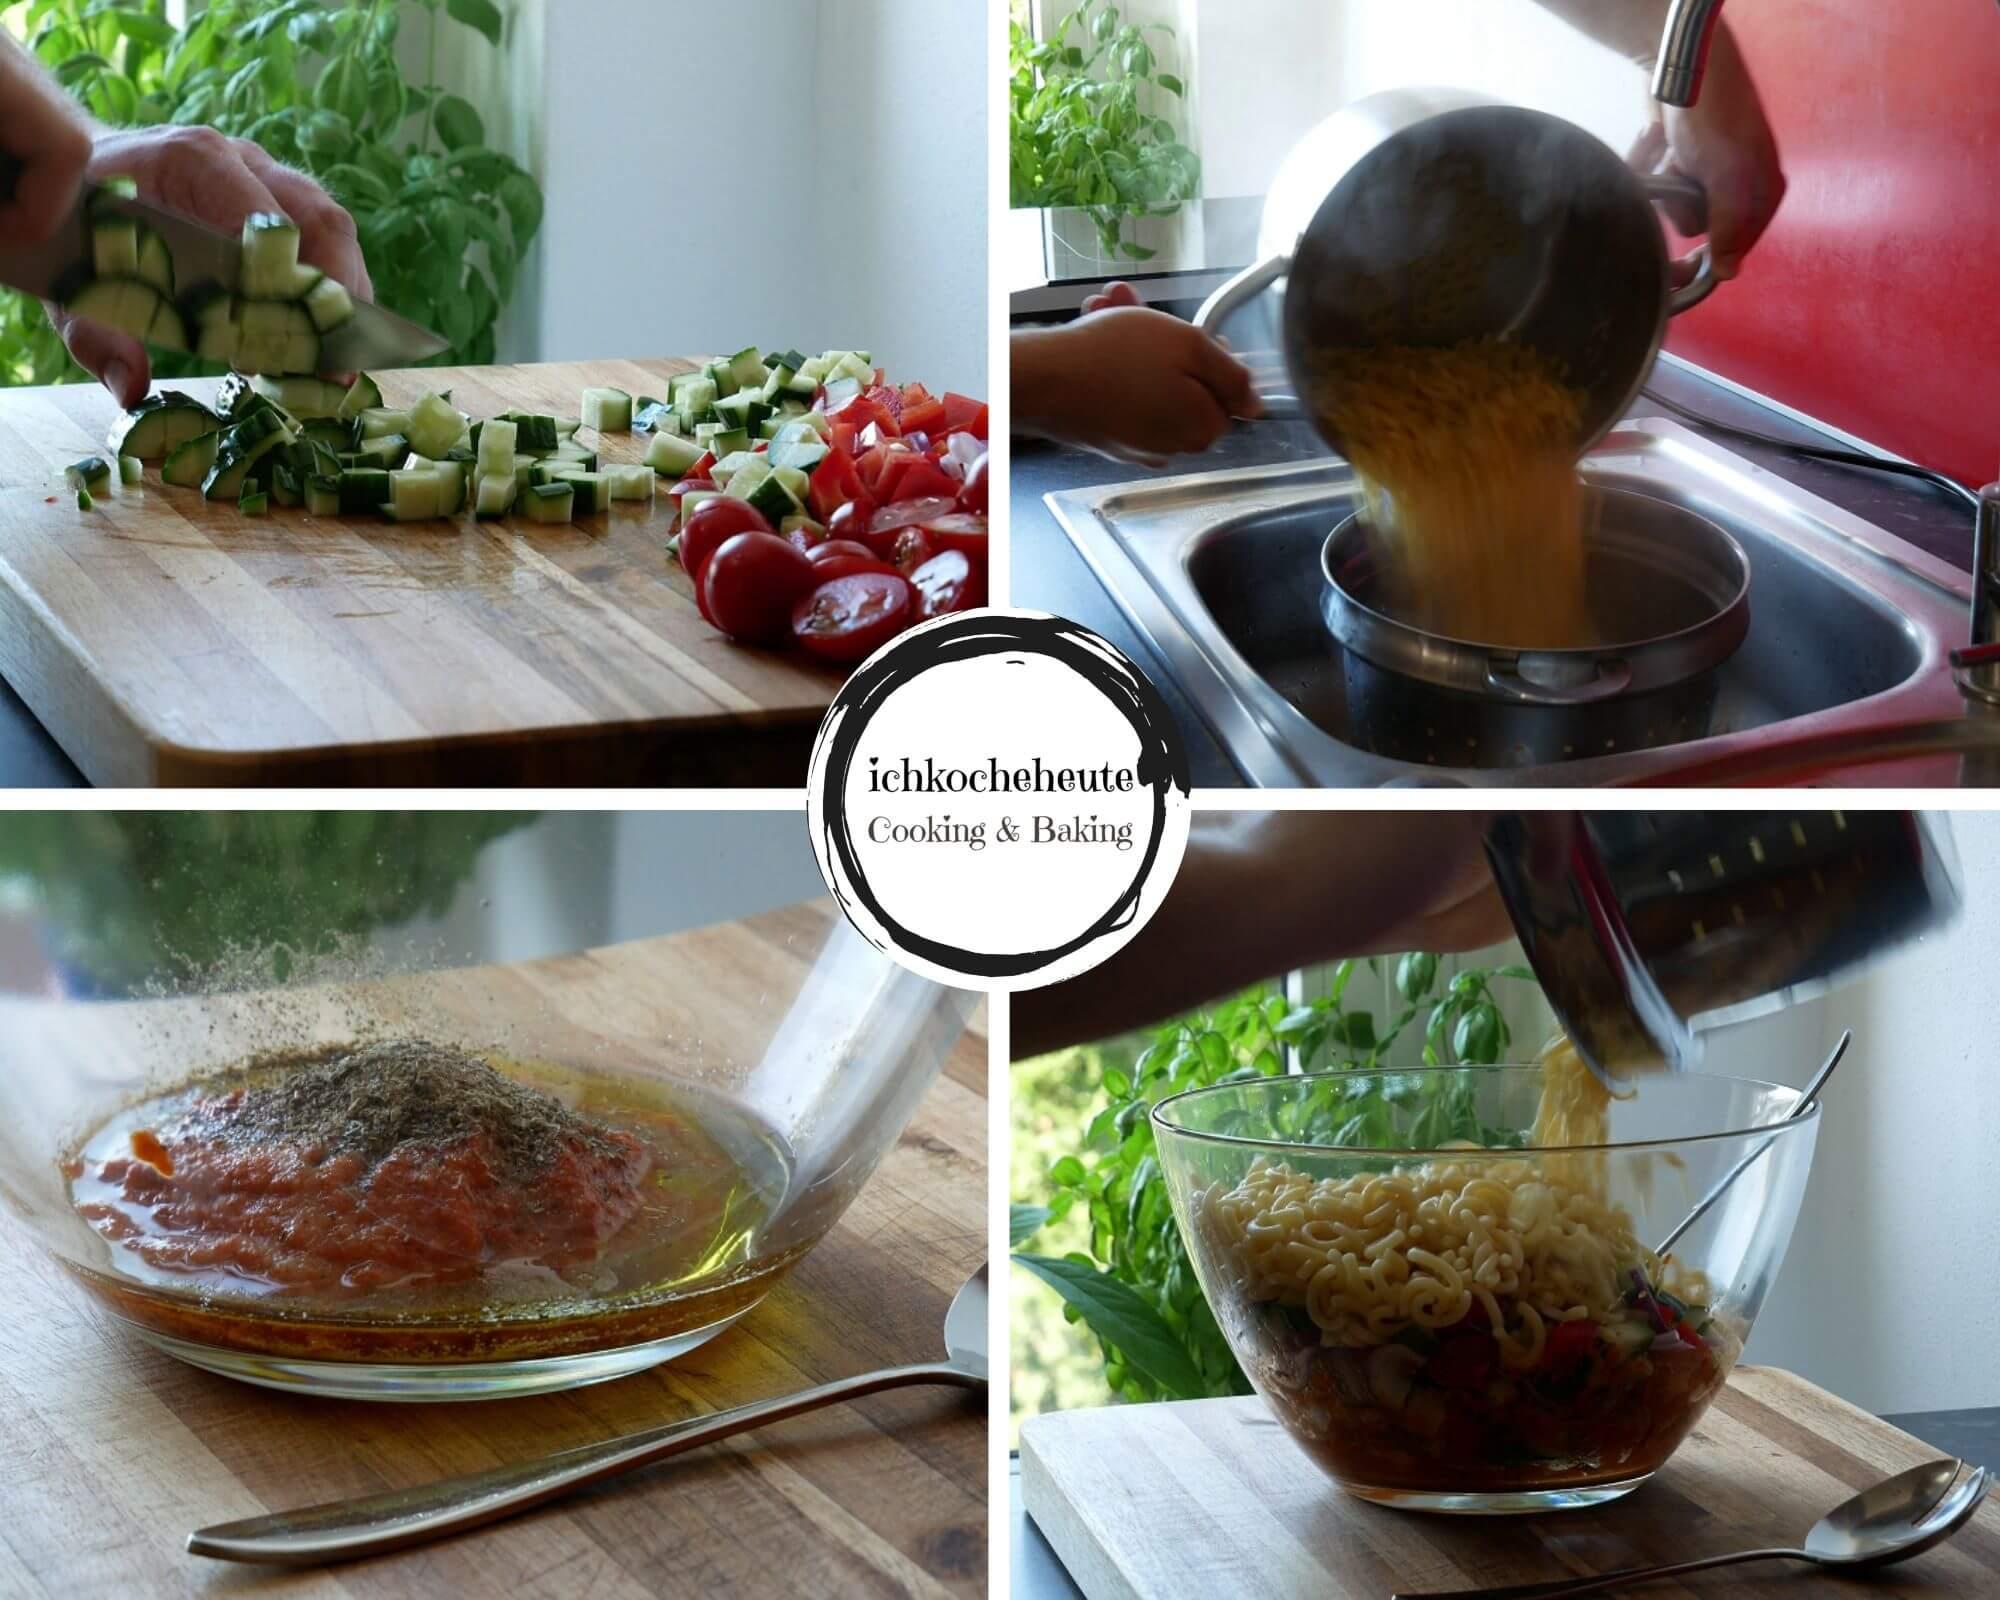 Preparations for Pasta Salad with Feta & Veggies